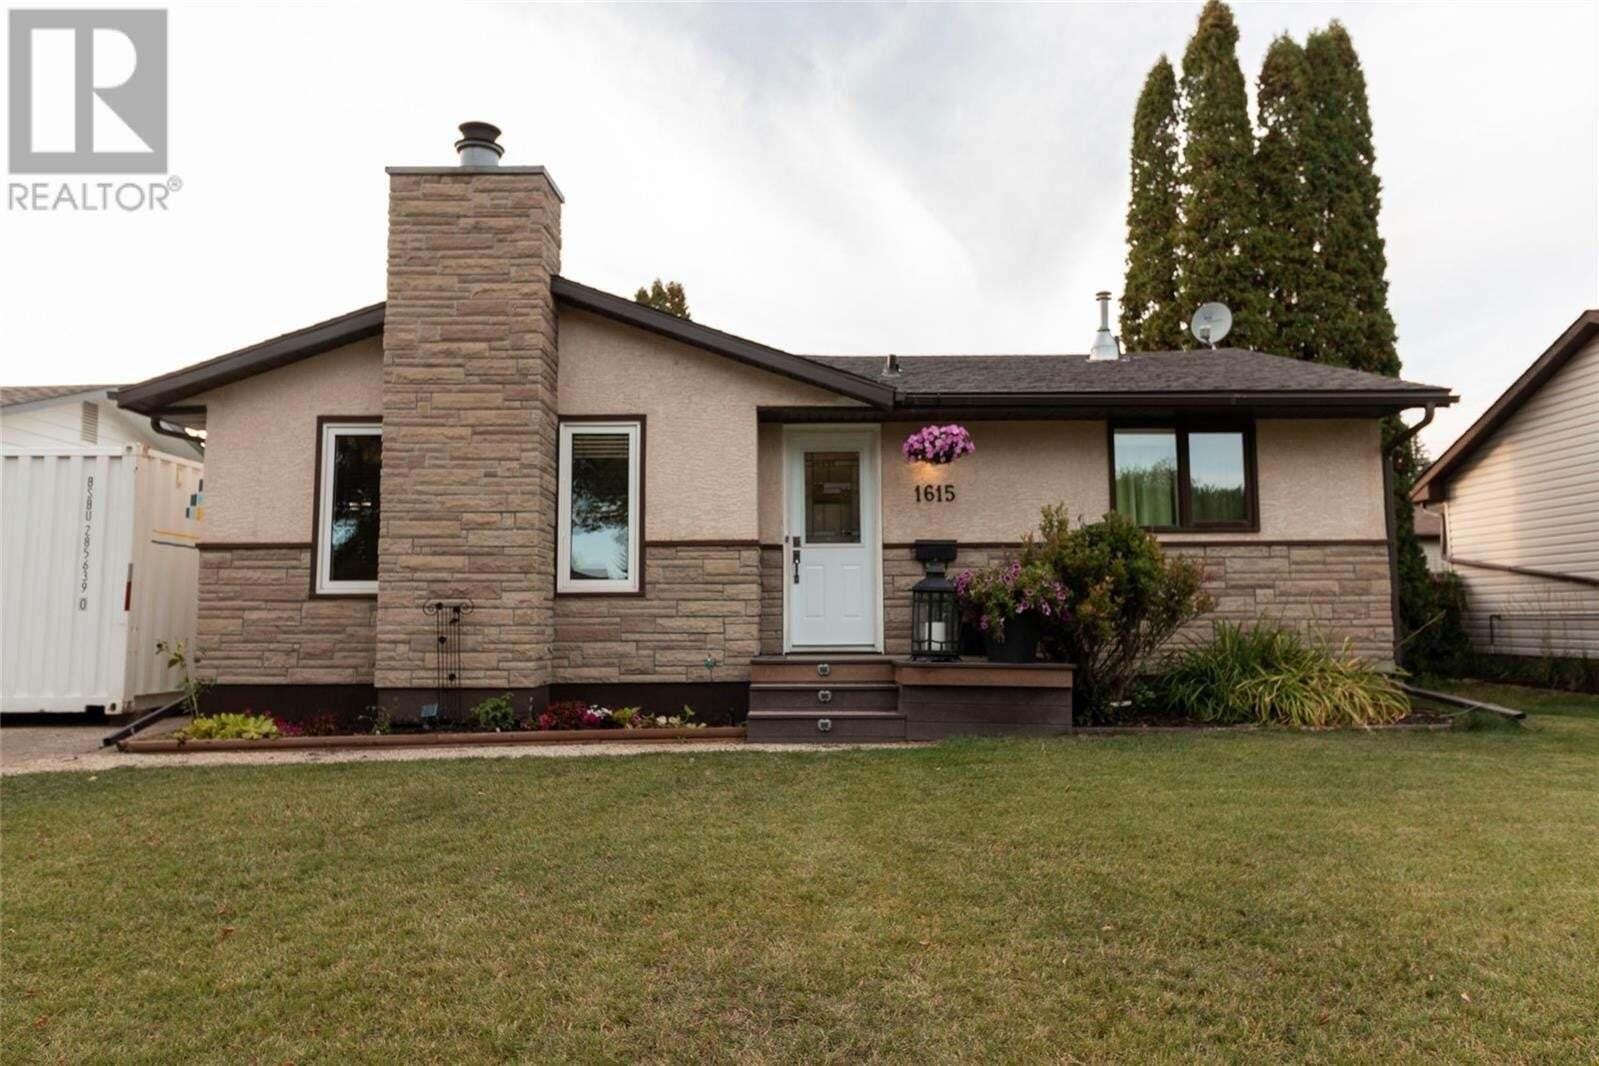 House for sale at 1615 8th Ave N Saskatoon Saskatchewan - MLS: SK831231